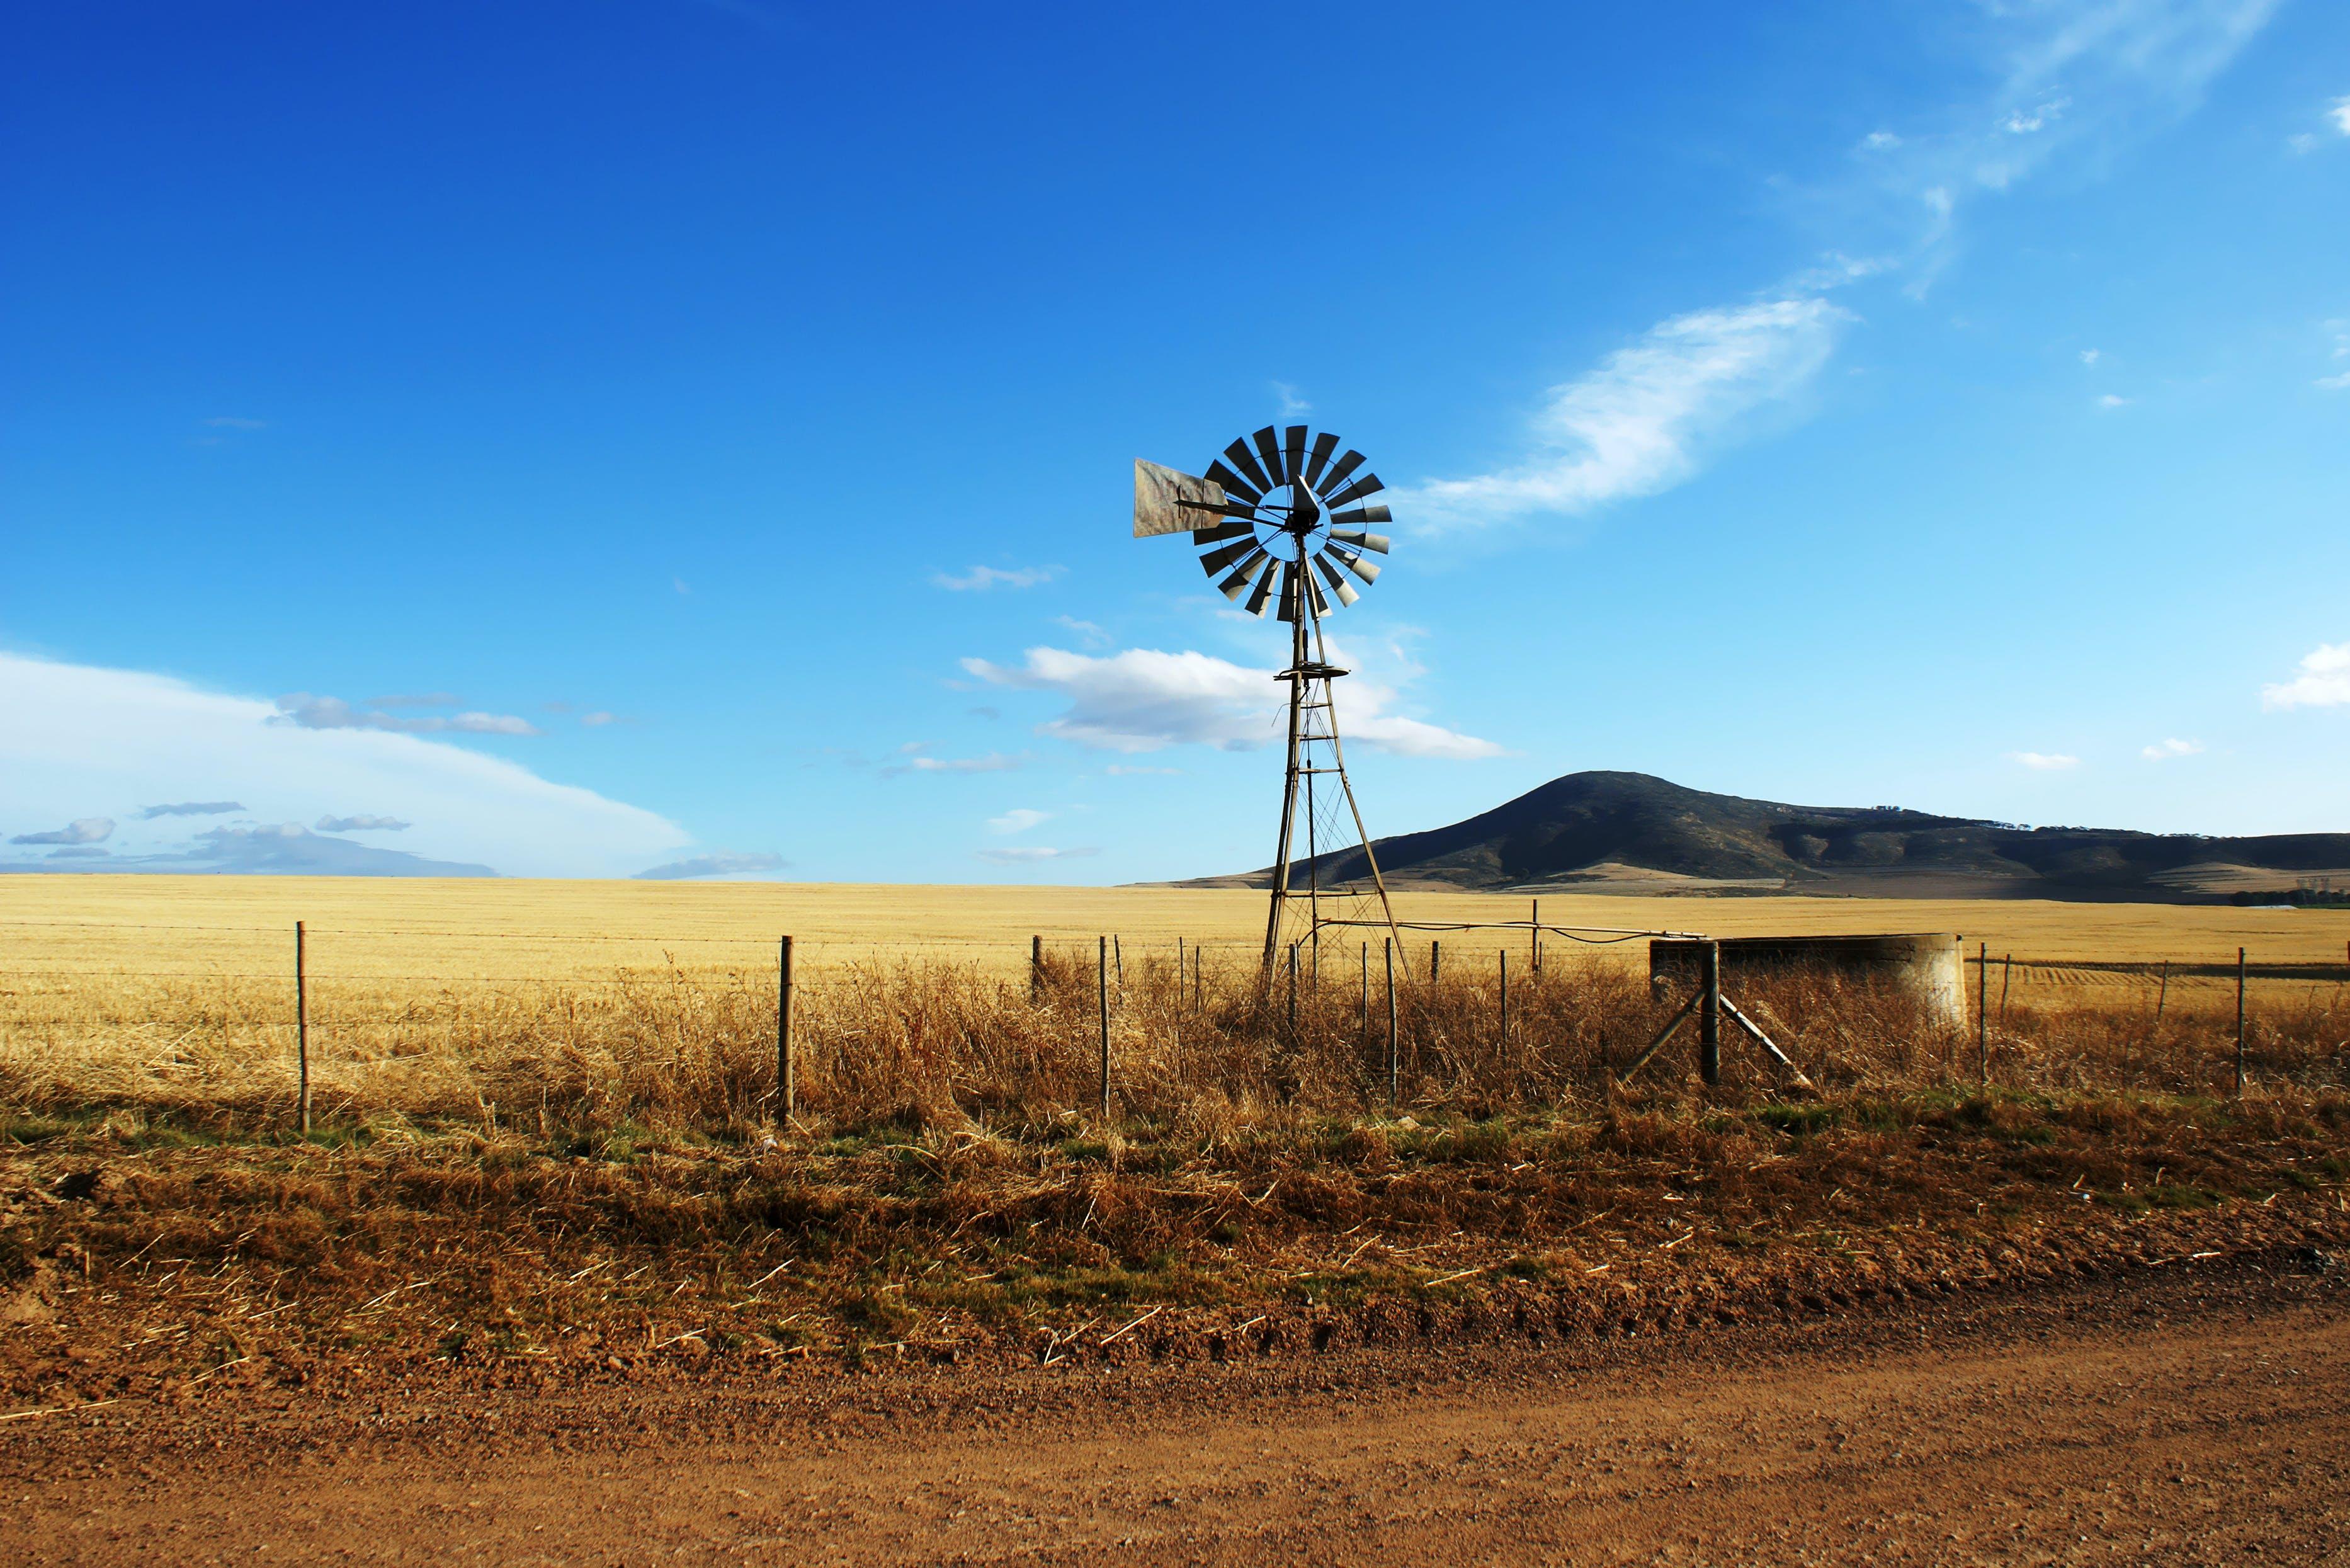 åkermark, bondgård, fält